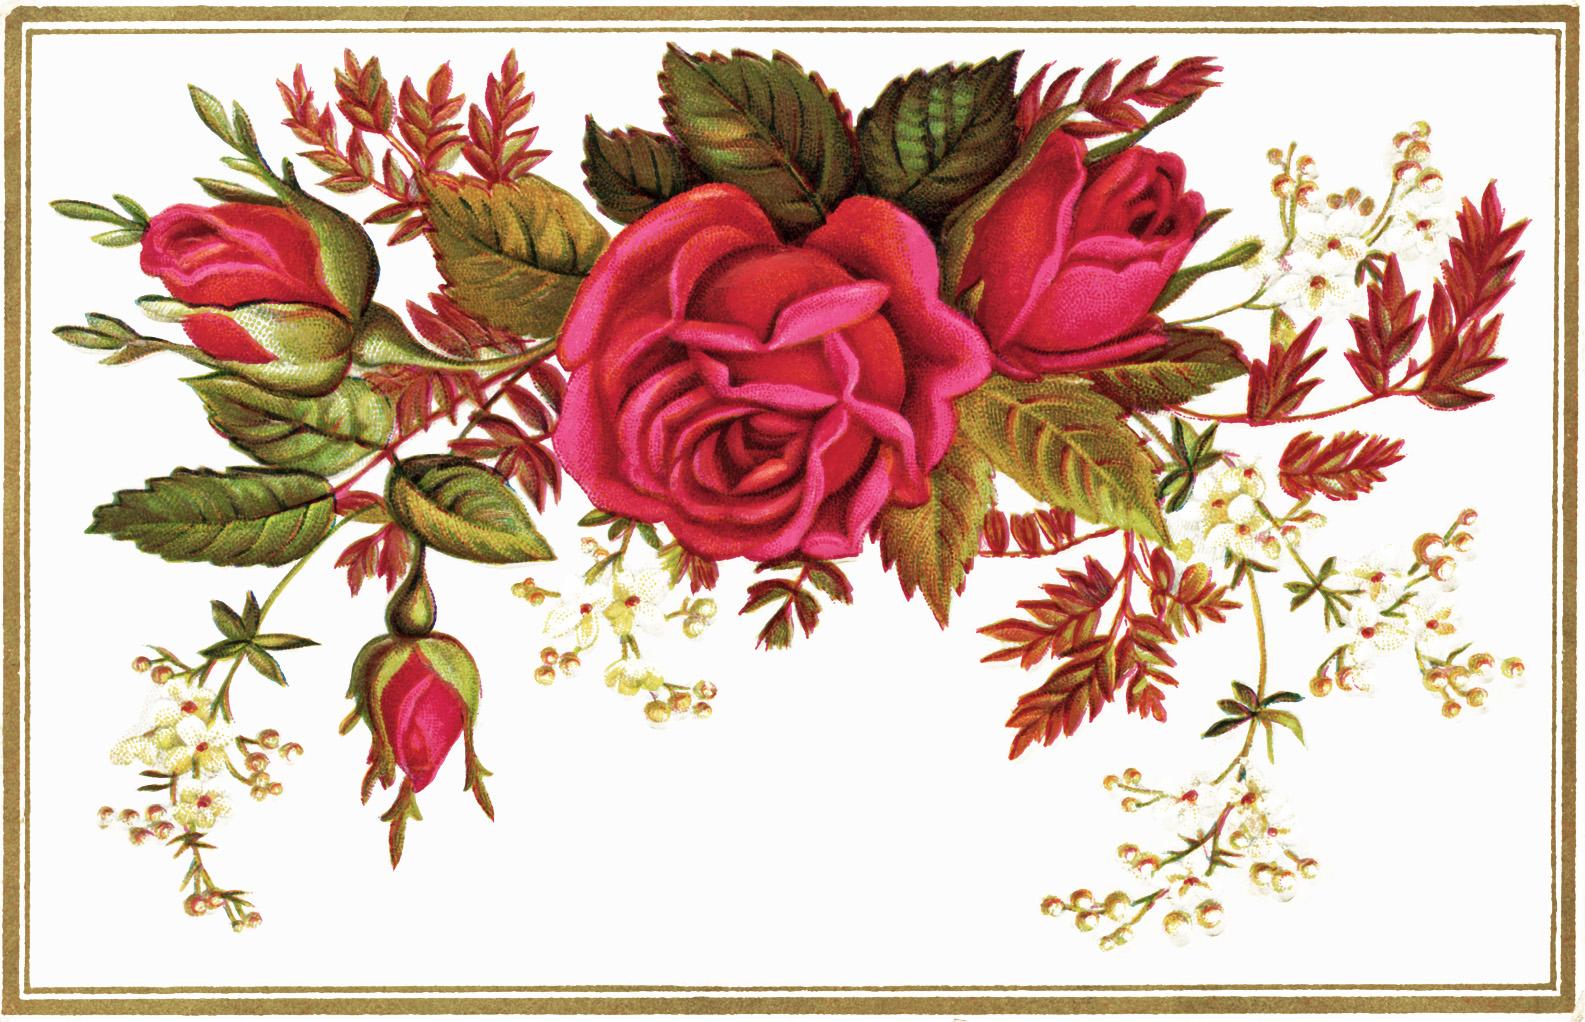 Free Vintage Flower Clip Art Flowers Old-Free Vintage Flower Clip Art Flowers Old Design Shop Blog Image-13